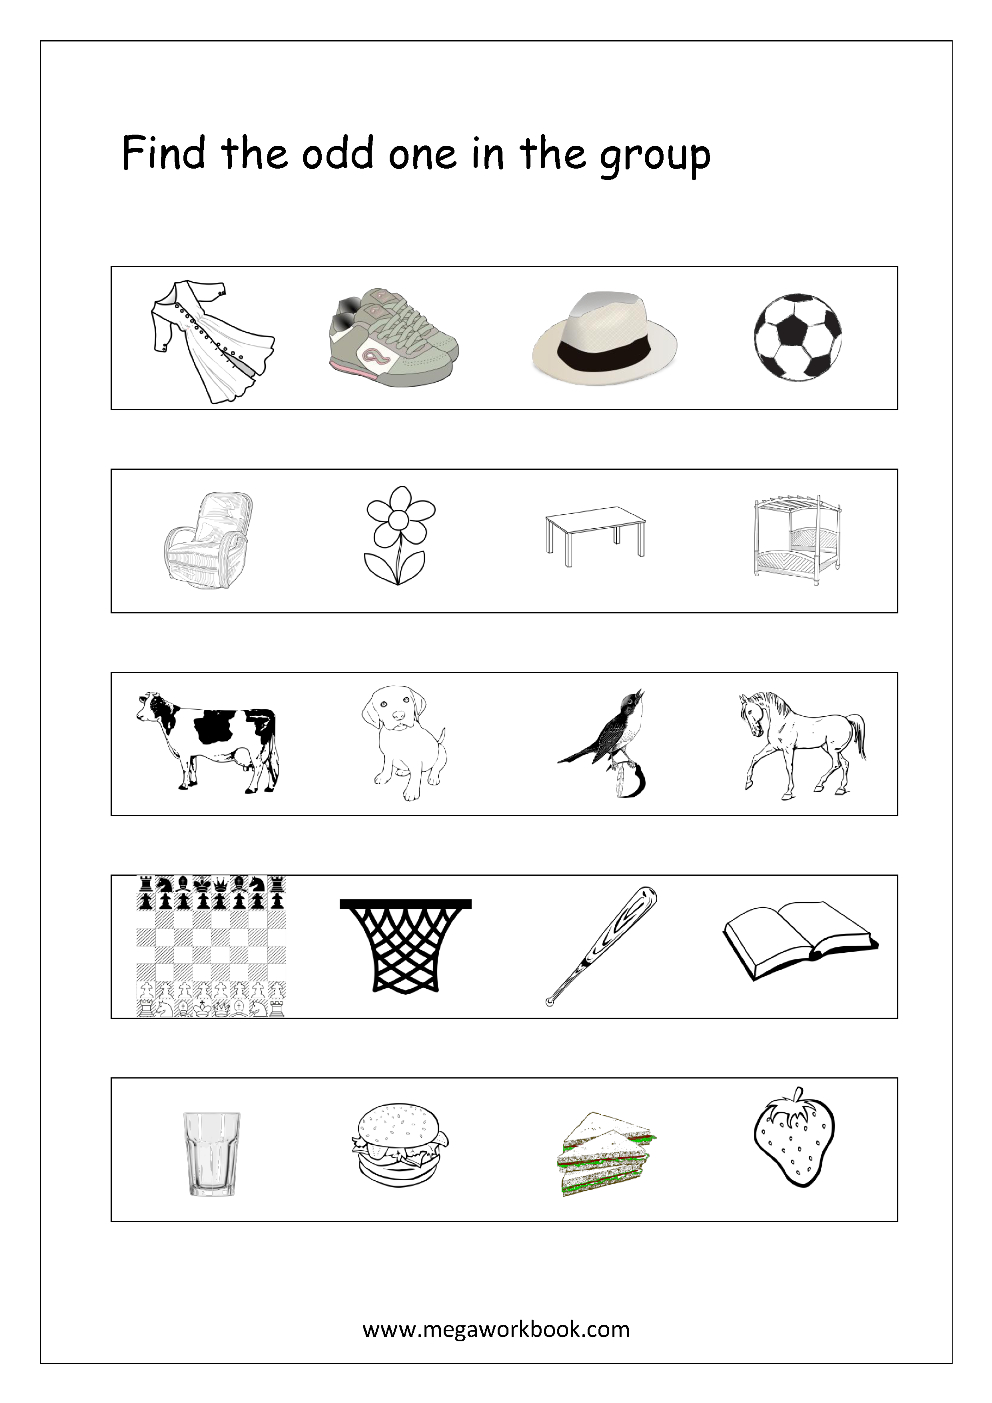 Free General Aptitude Worksheets - Odd One Out - Megaworkbook | Free Printable Worksheets For Kids Science